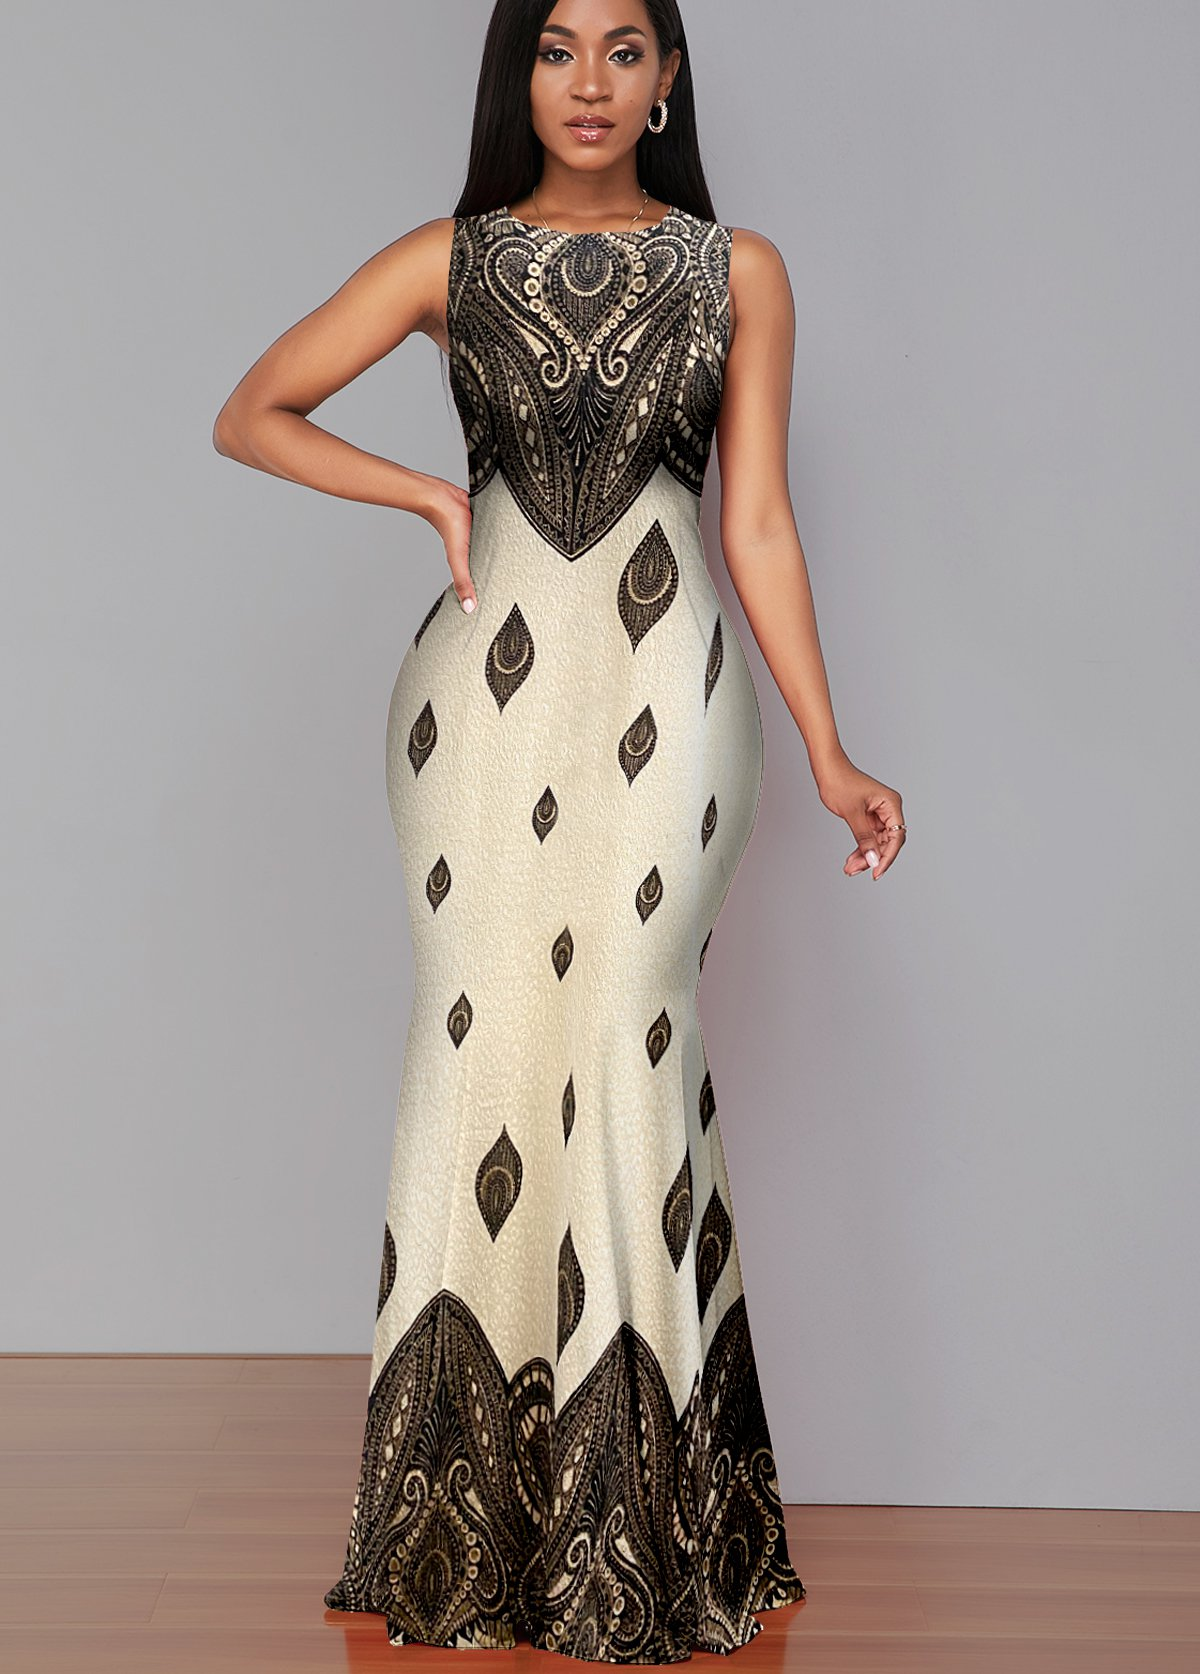 ROTITA Round Neck Criss Cross Back Sleeveless Dress